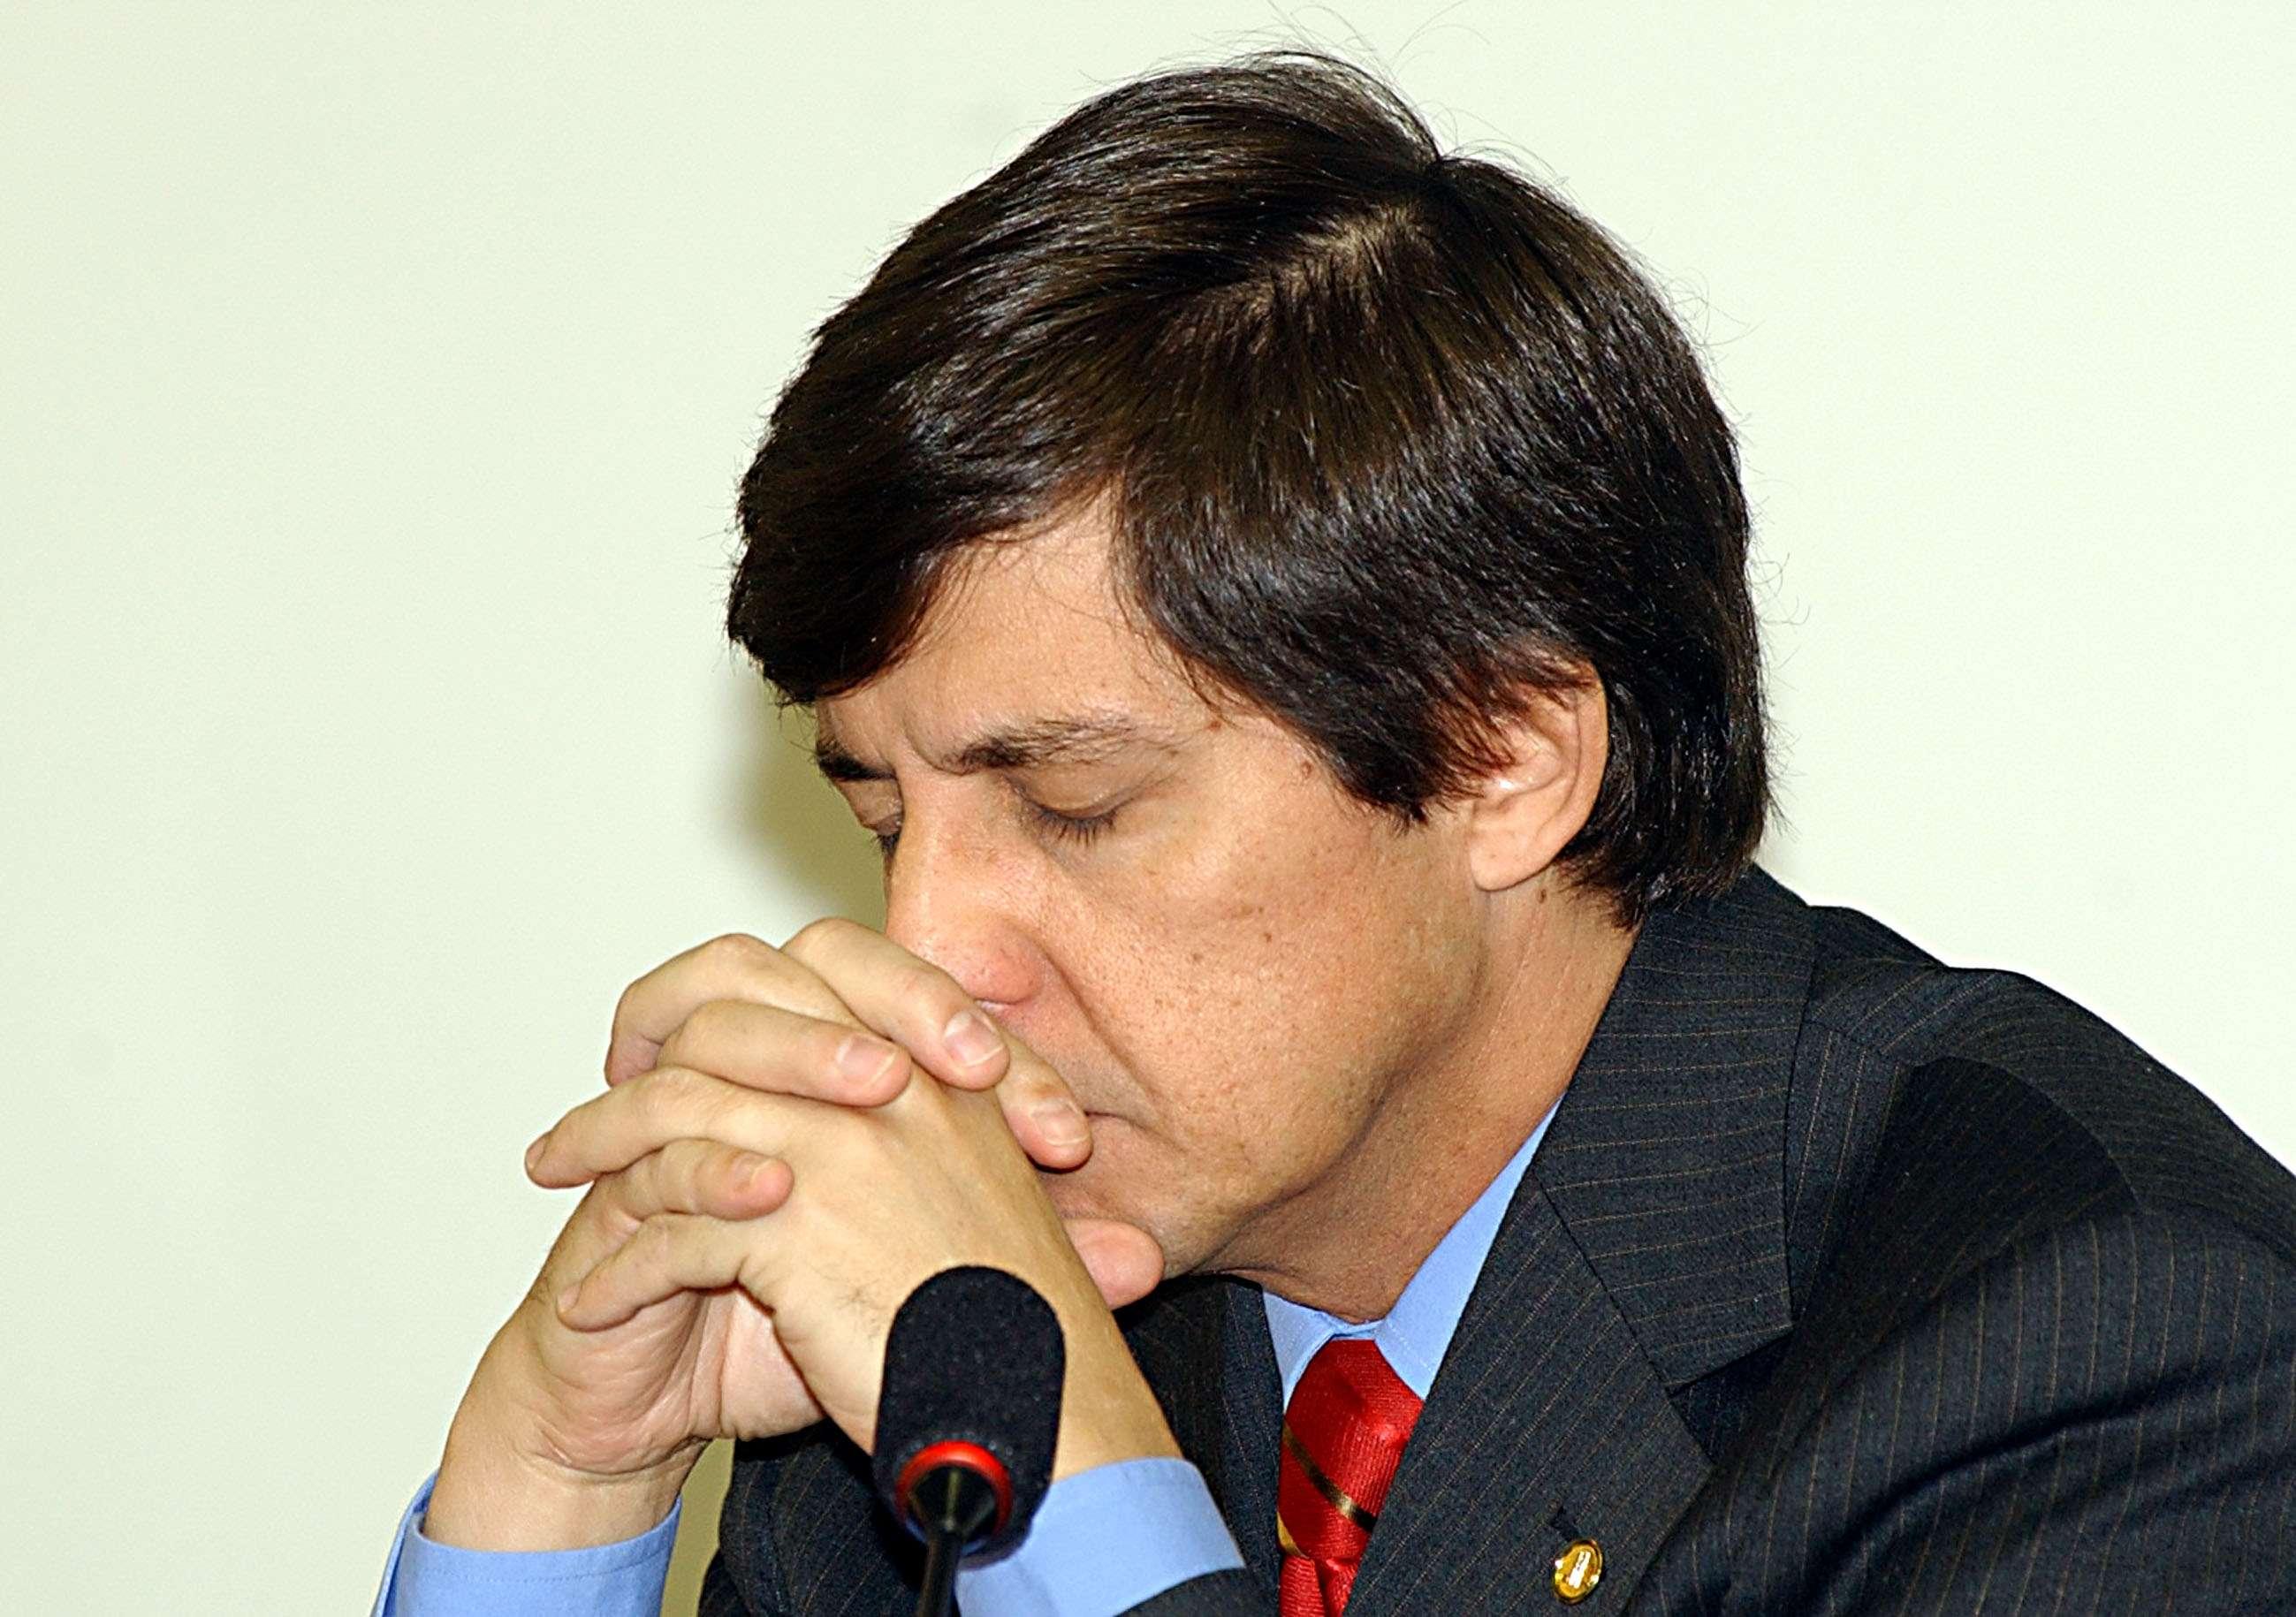 Bispo Rodrigues Foto: José Cruz/Agência Brasil